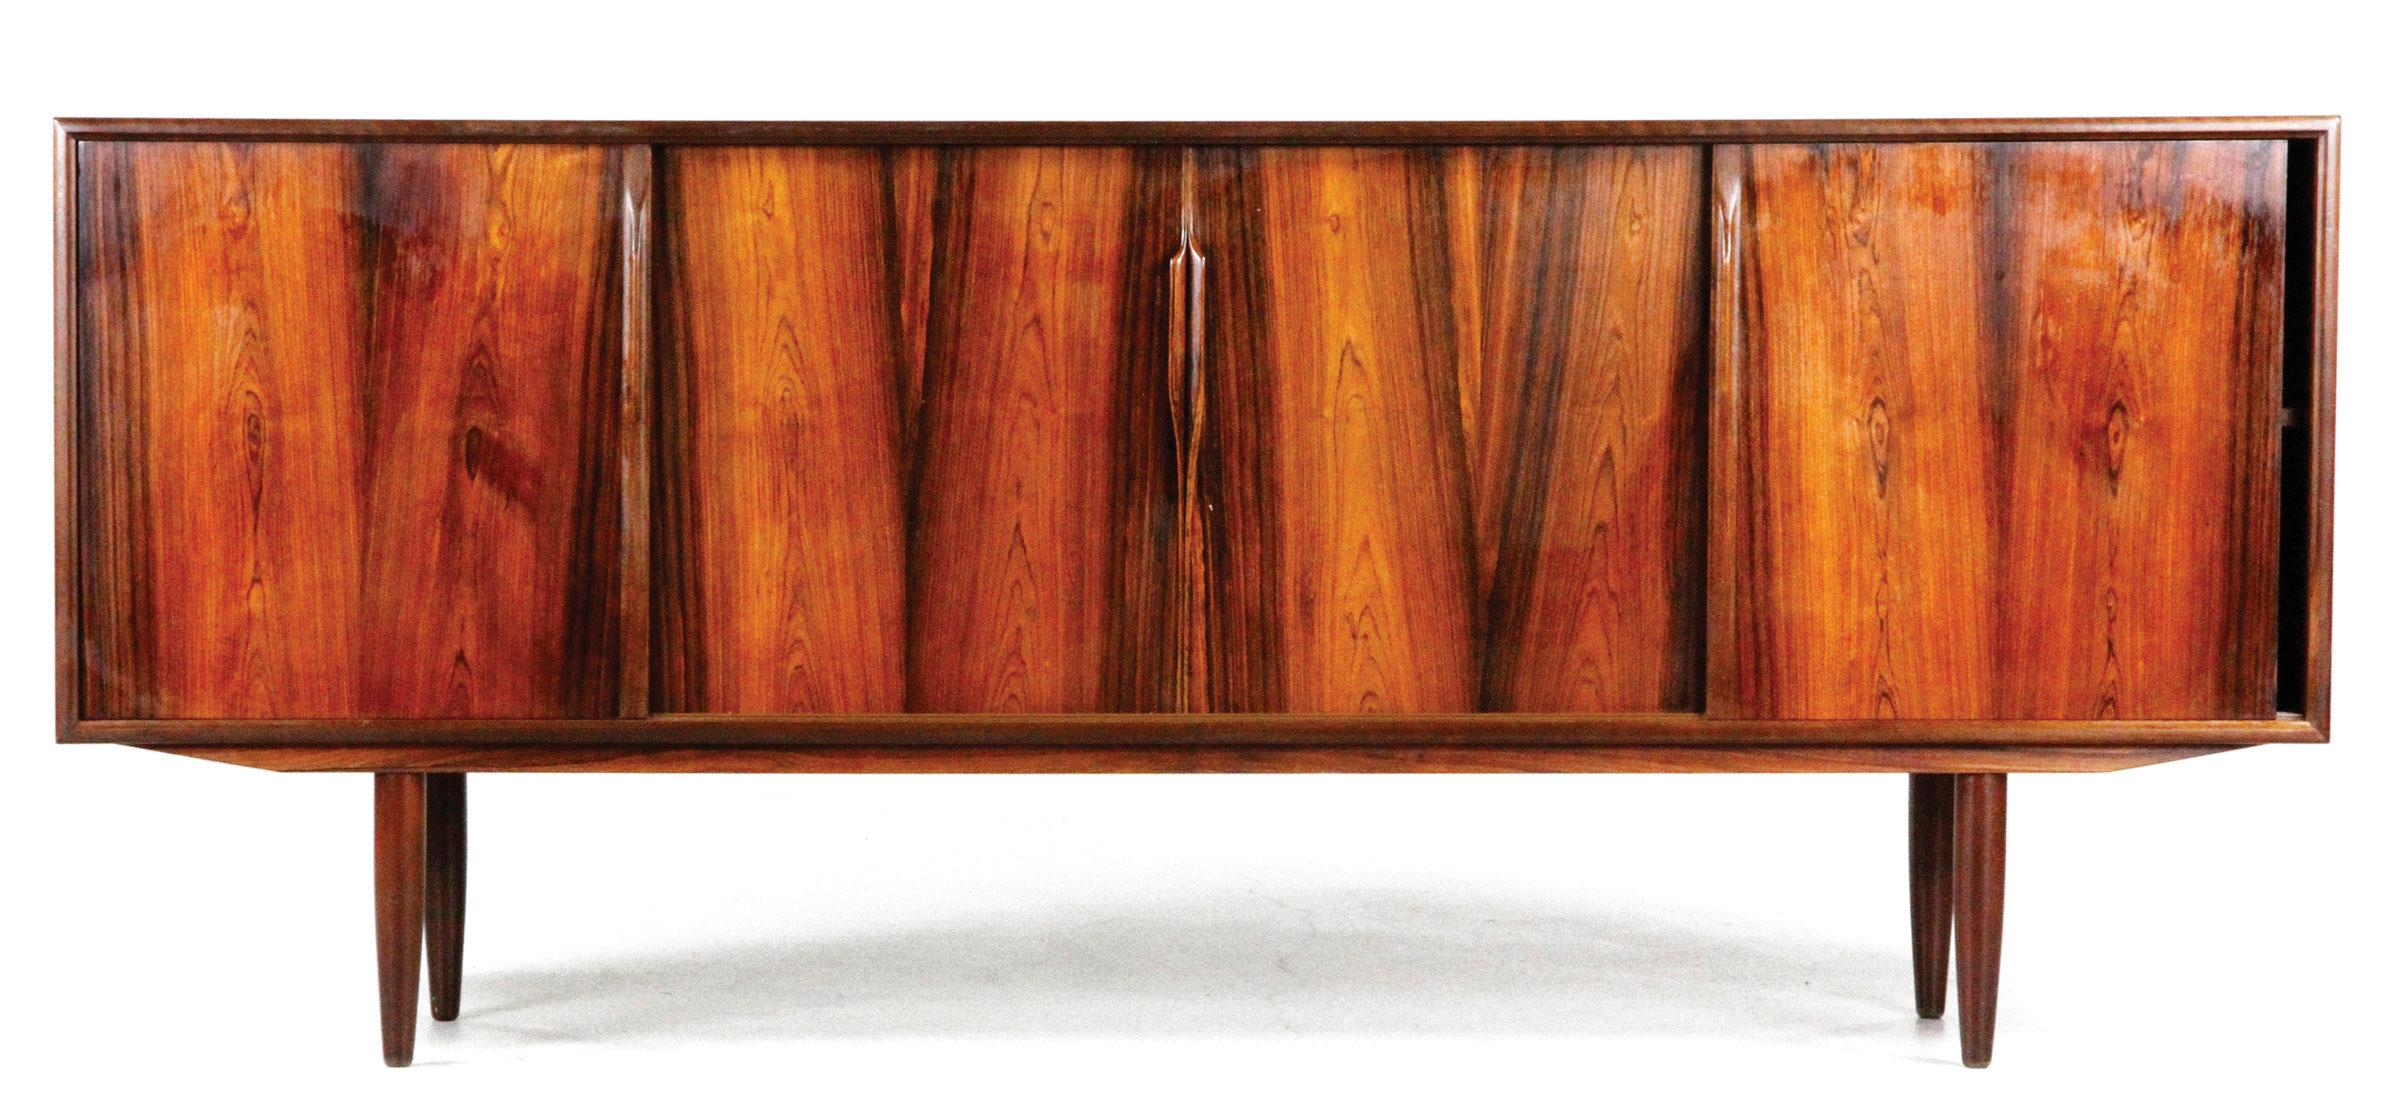 Axel Christiansen Danish Modern Credenza, Rosewood, Design Attributed To  Gunni Omann ...